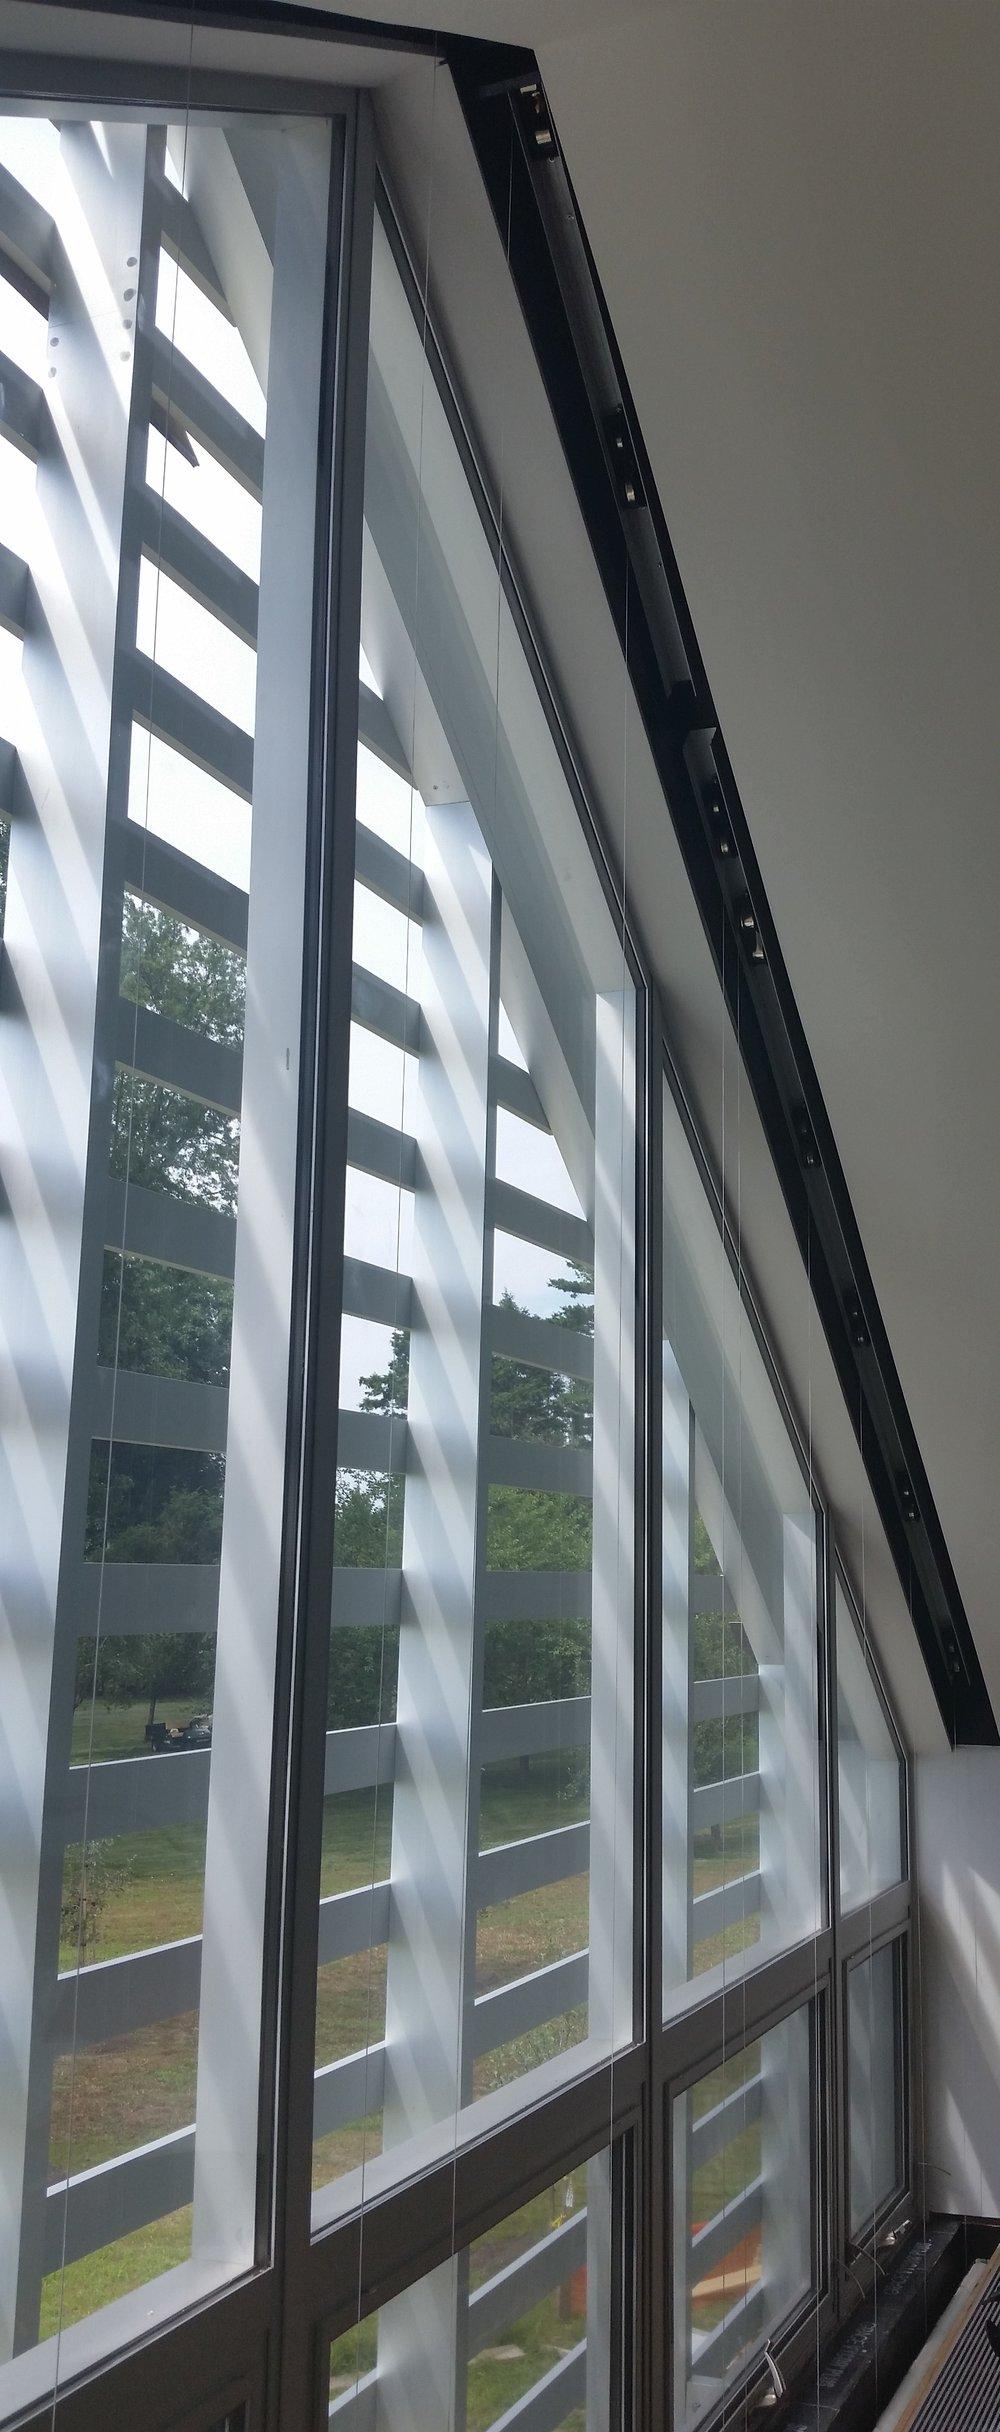 window on angle.jpg